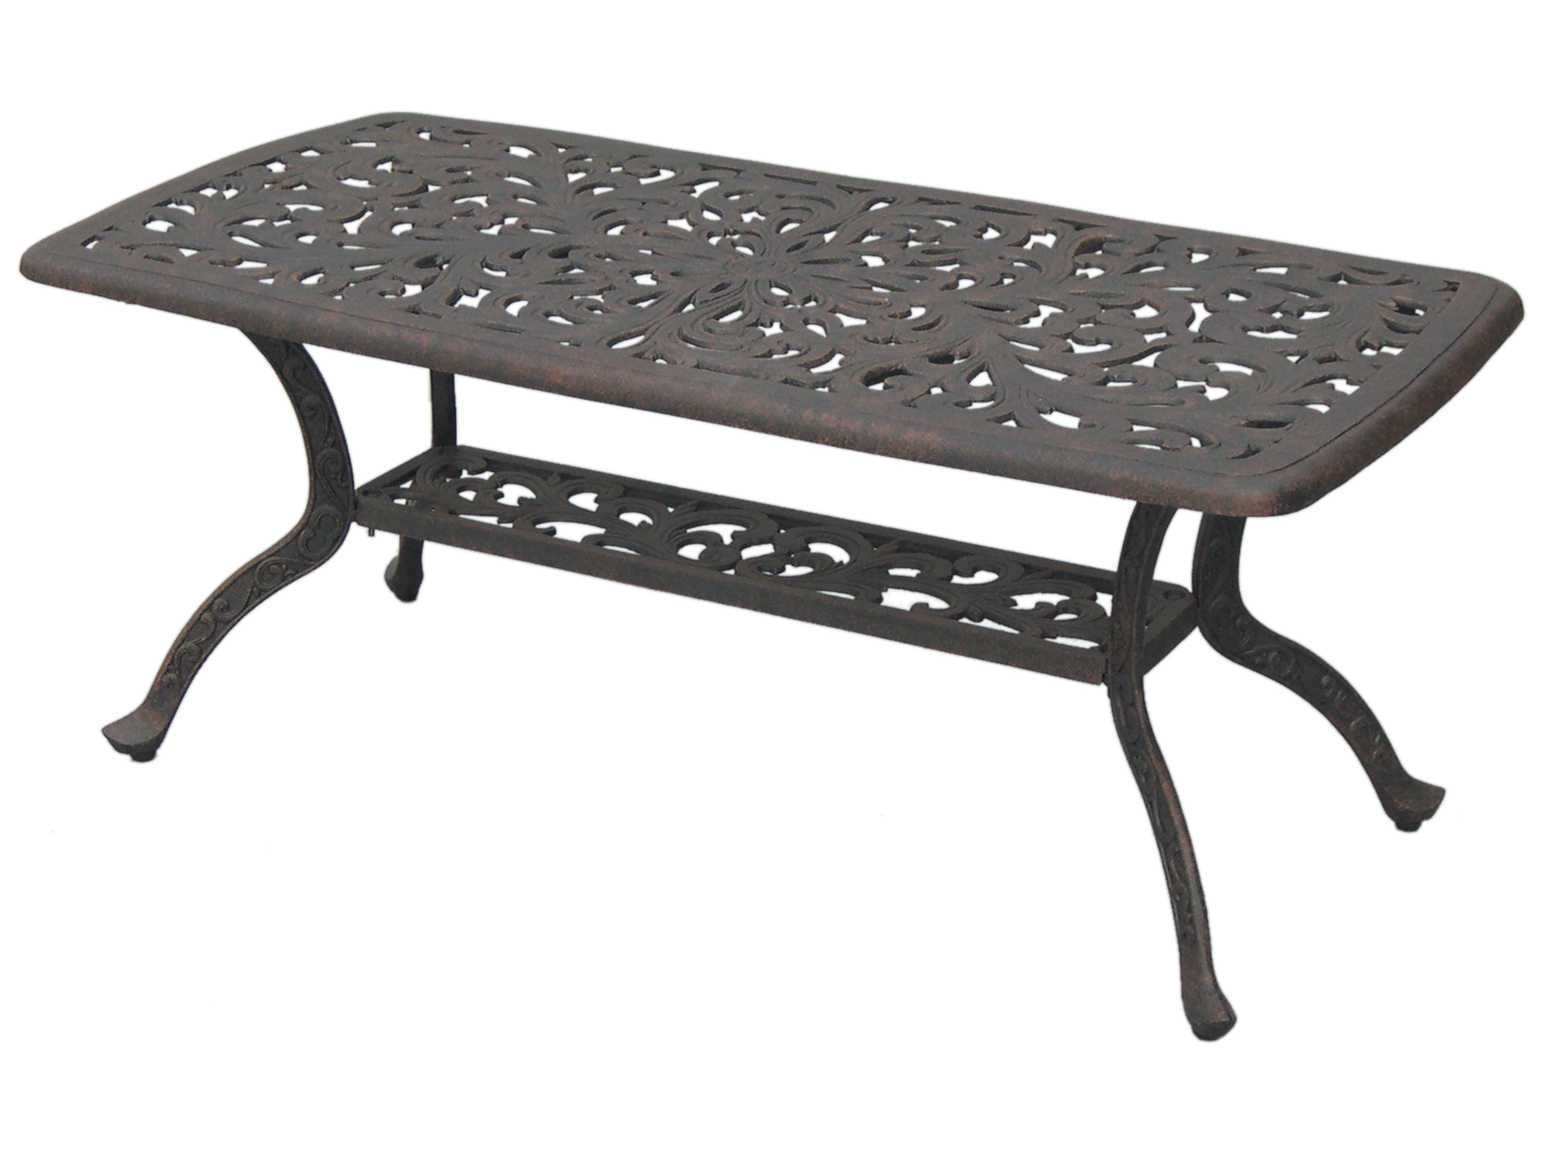 Darlee Outdoor Living Series 80 Cast Aluminum Antique Bronze 42 X 21 Rectangular Coffee Table